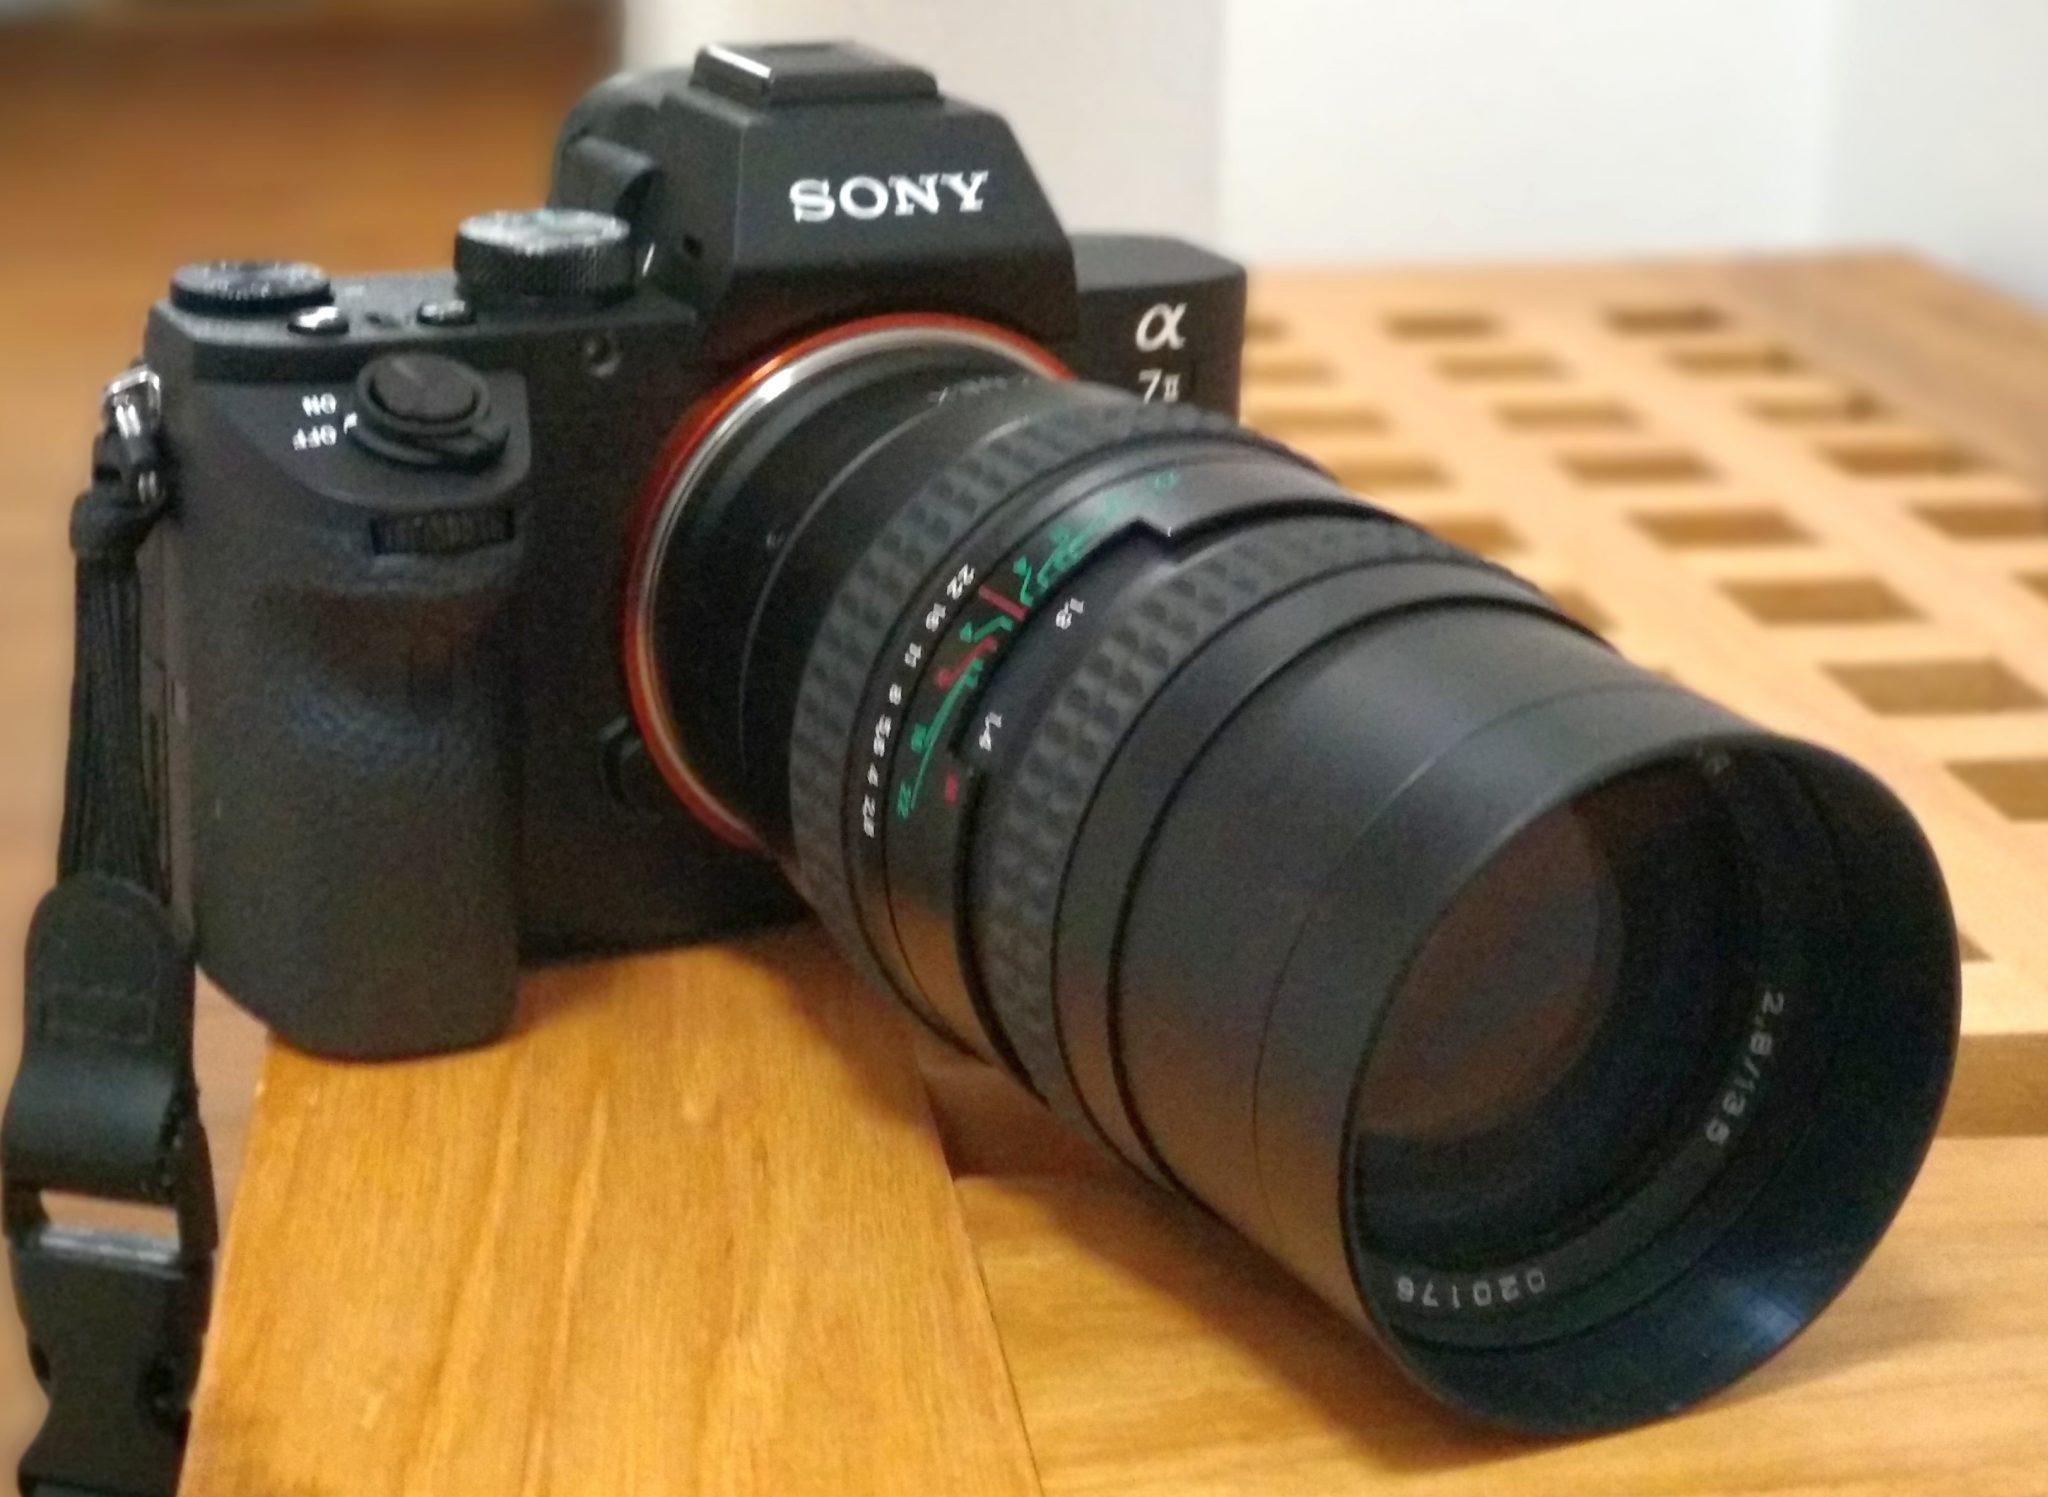 Objektivtest: Zenit MC Telezenitar 135mm 2.8 (M42) an Sony A7II